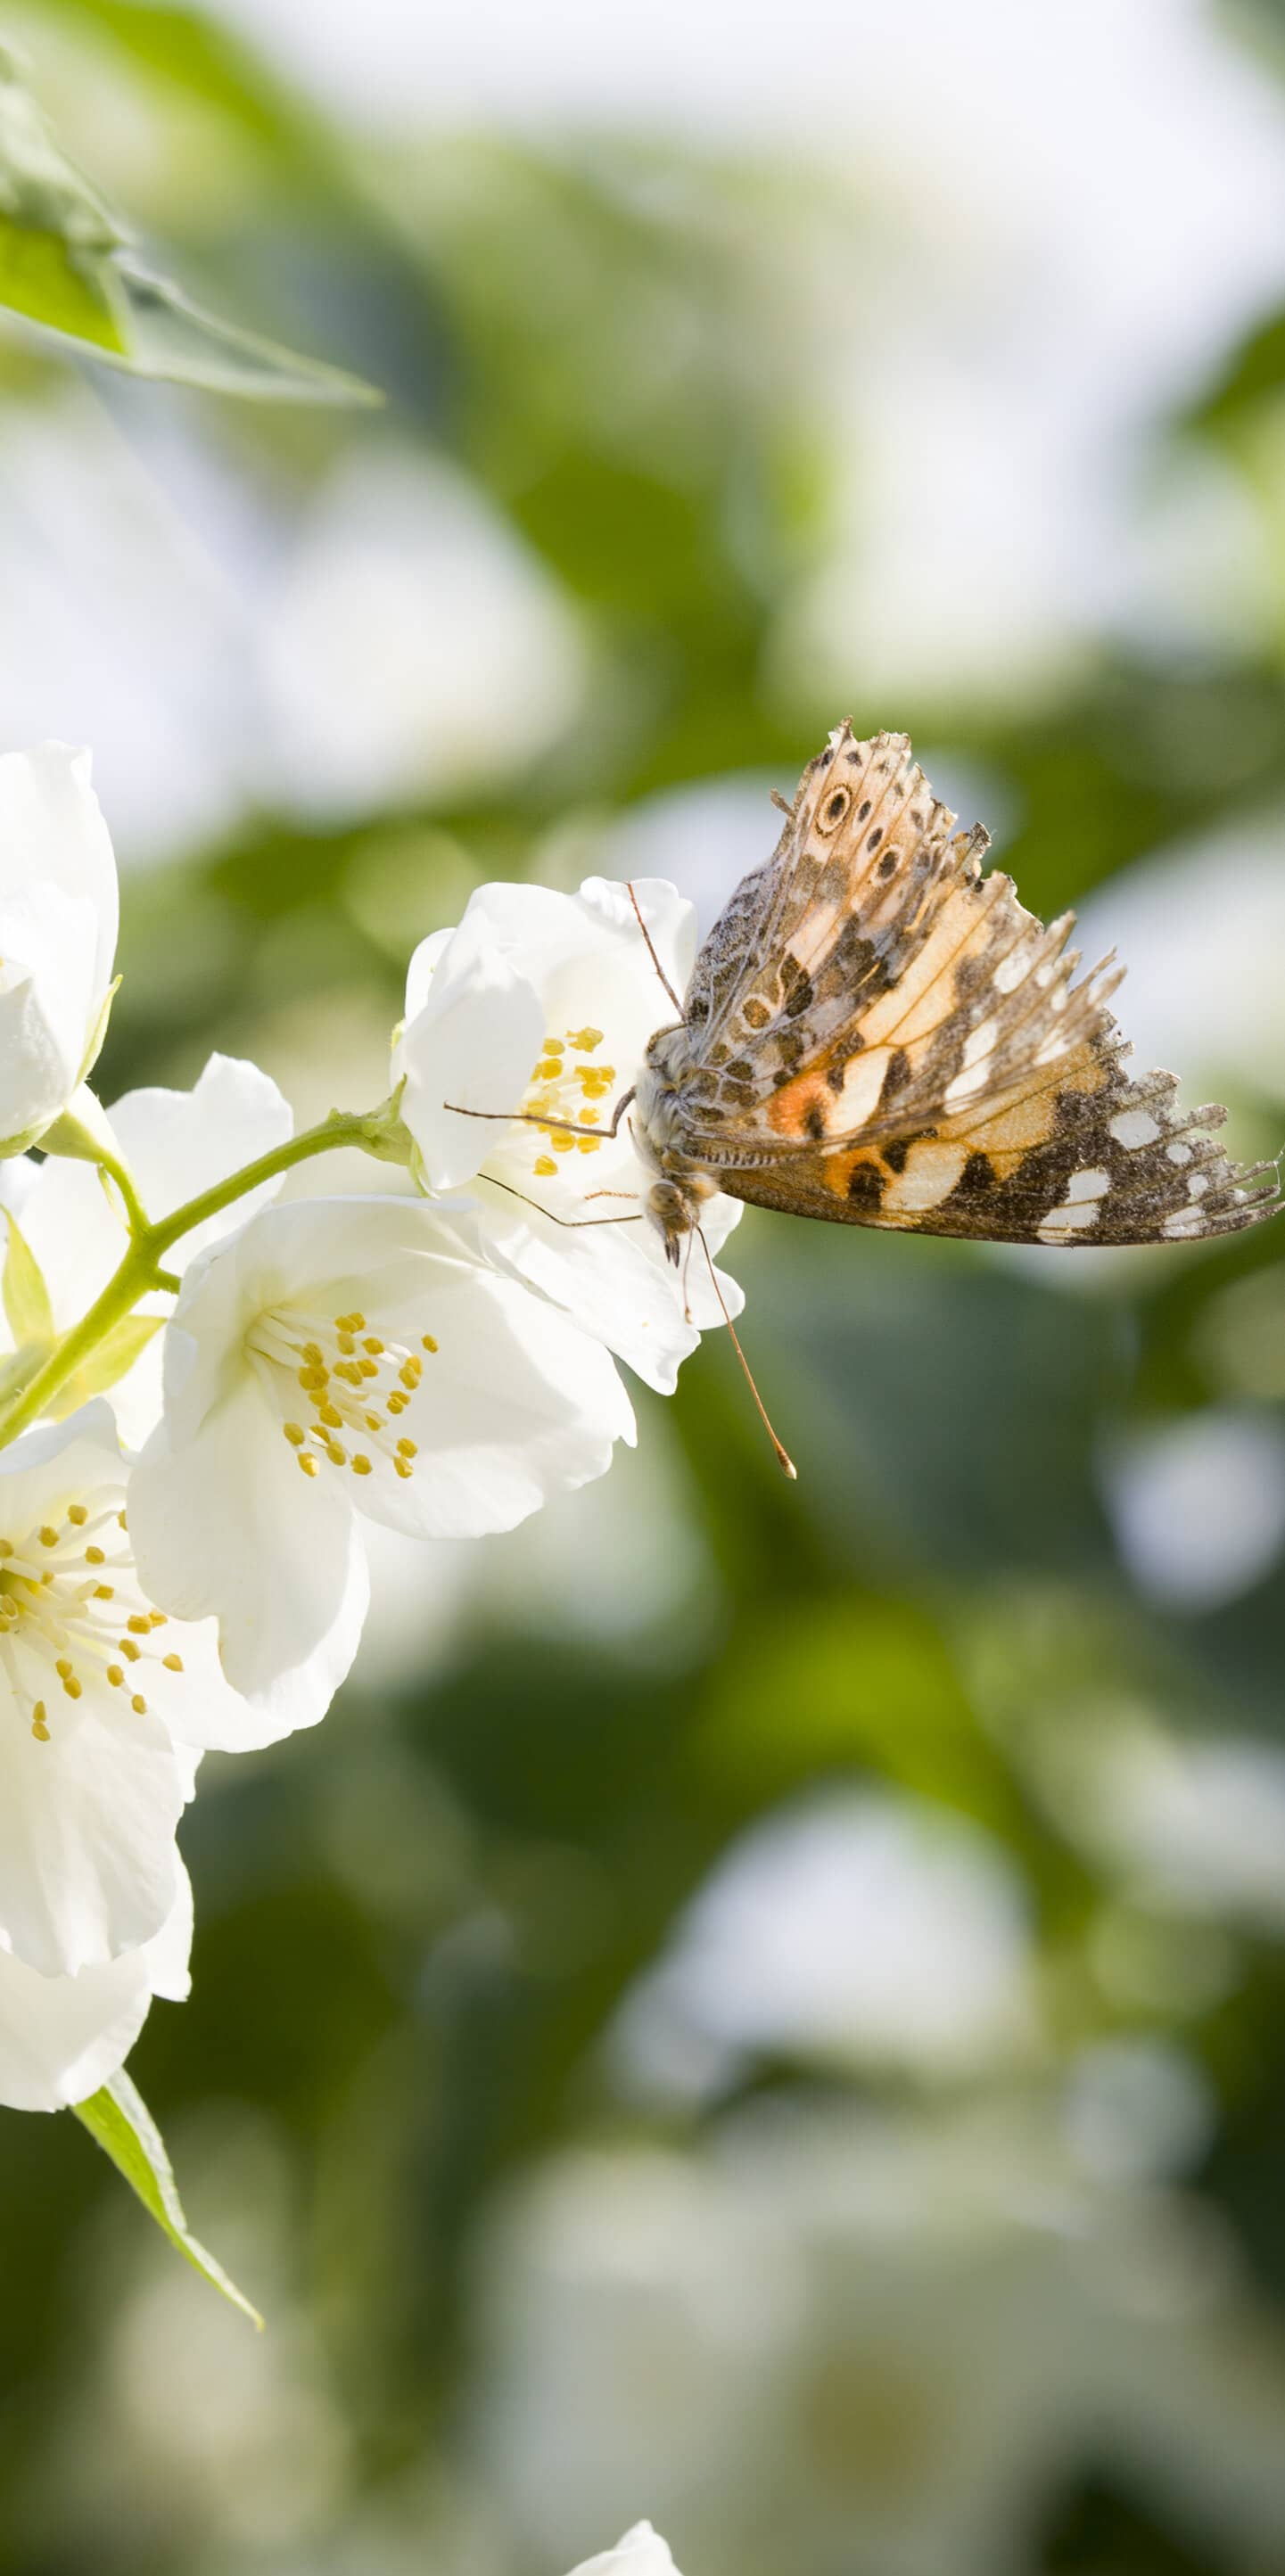 обои жасмин и бабочка